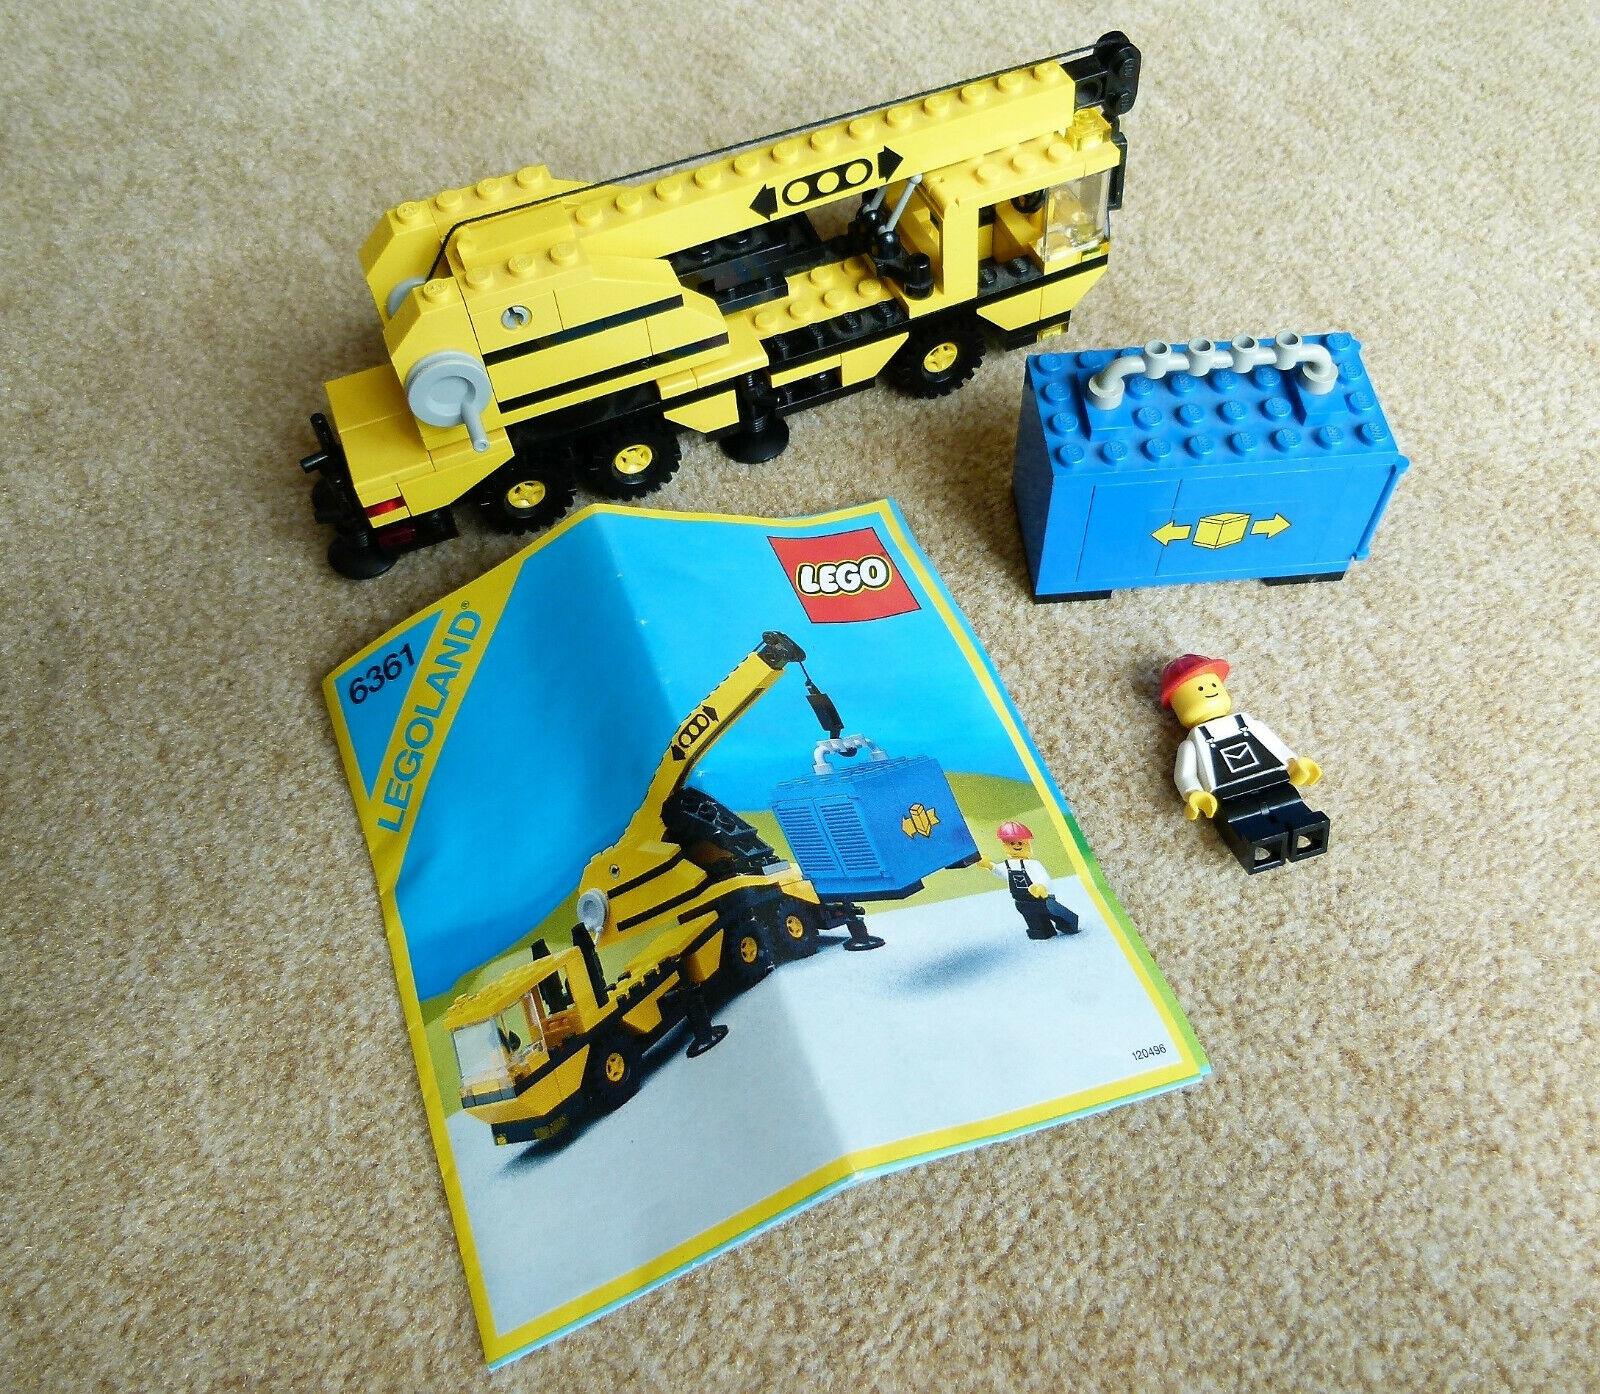 6 modelos lego recopilación 6361 6507 6524 6627 6658 6673 Legoland avión pala